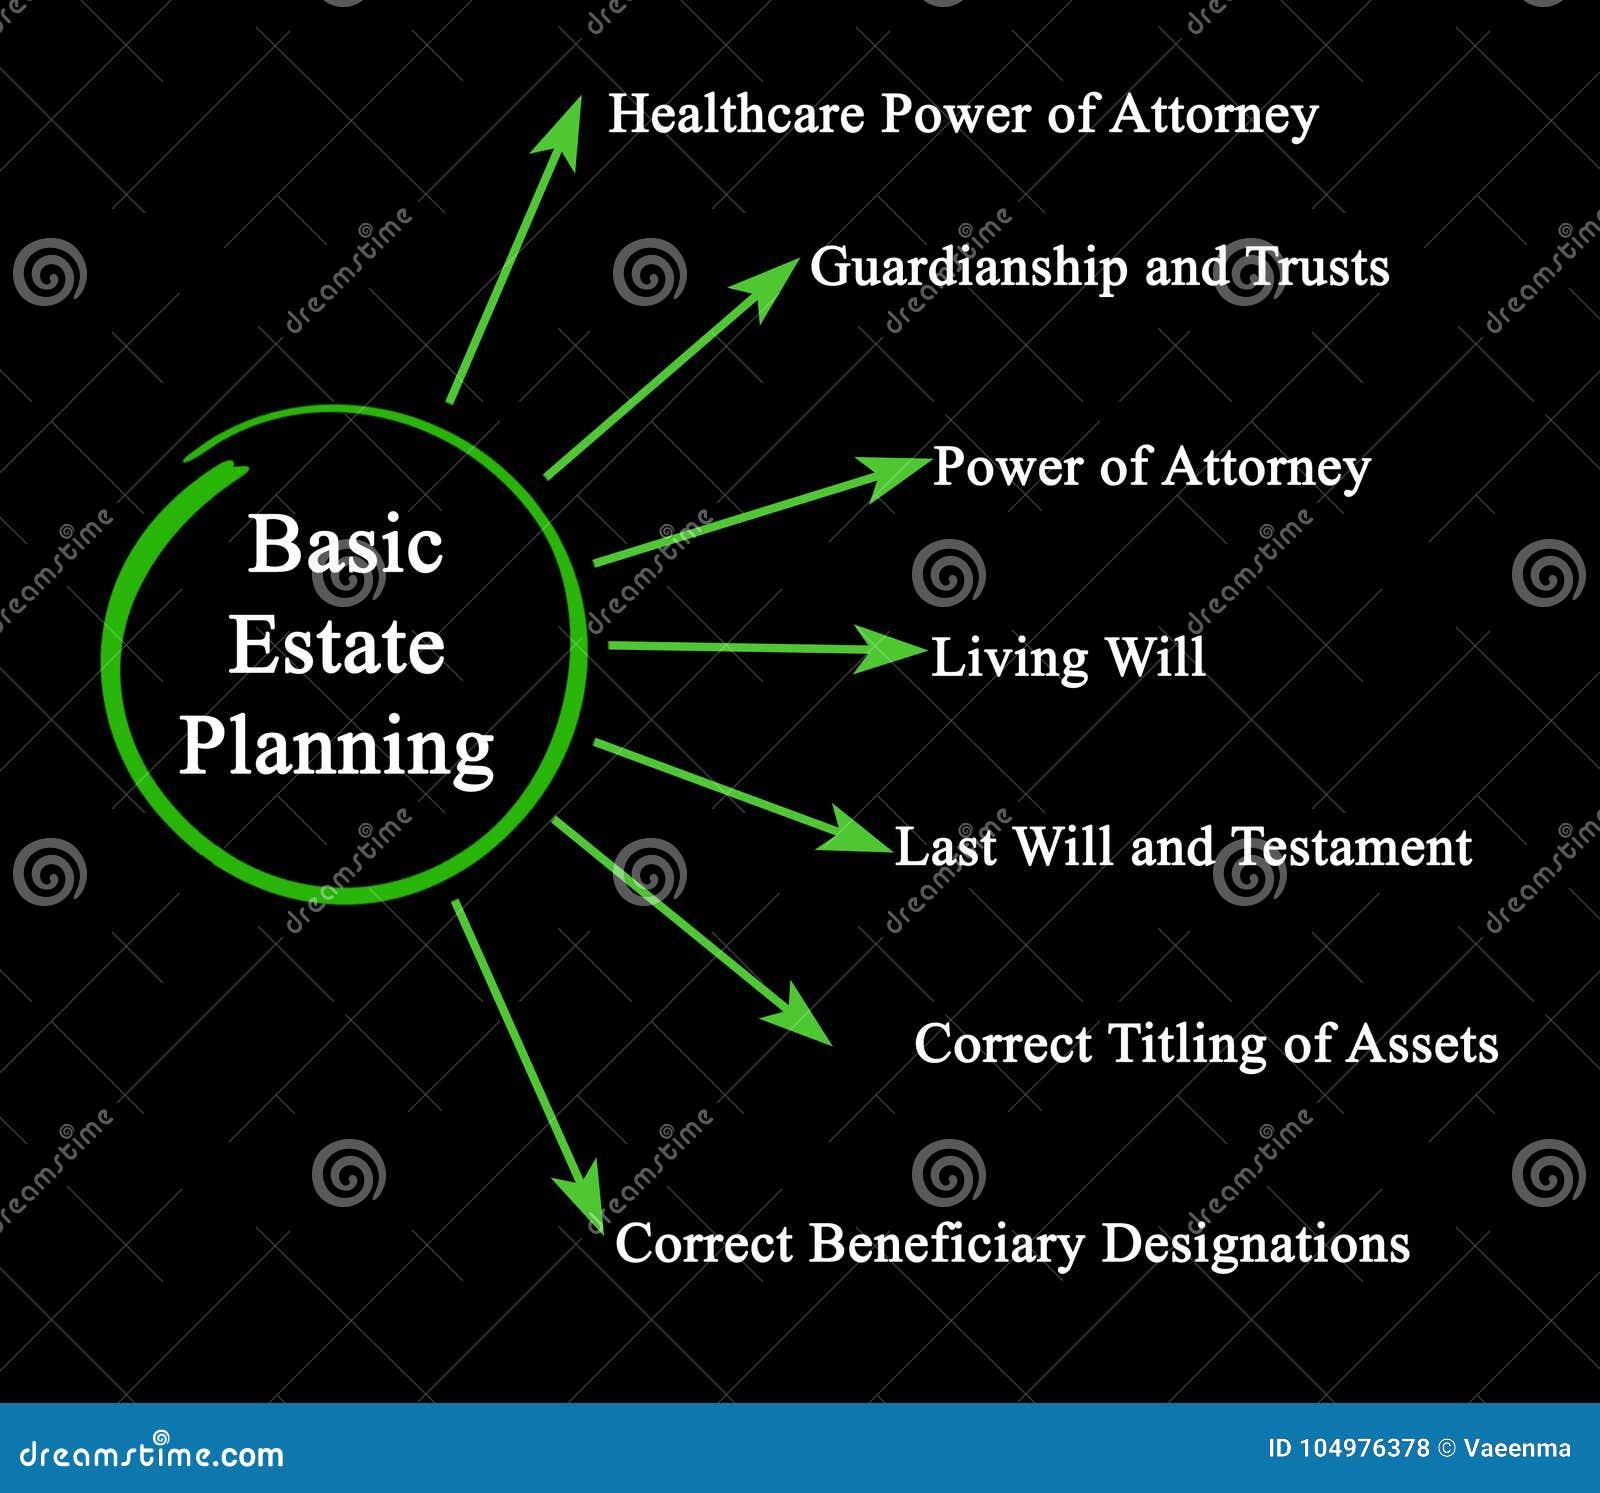 Basislandgoed Planning